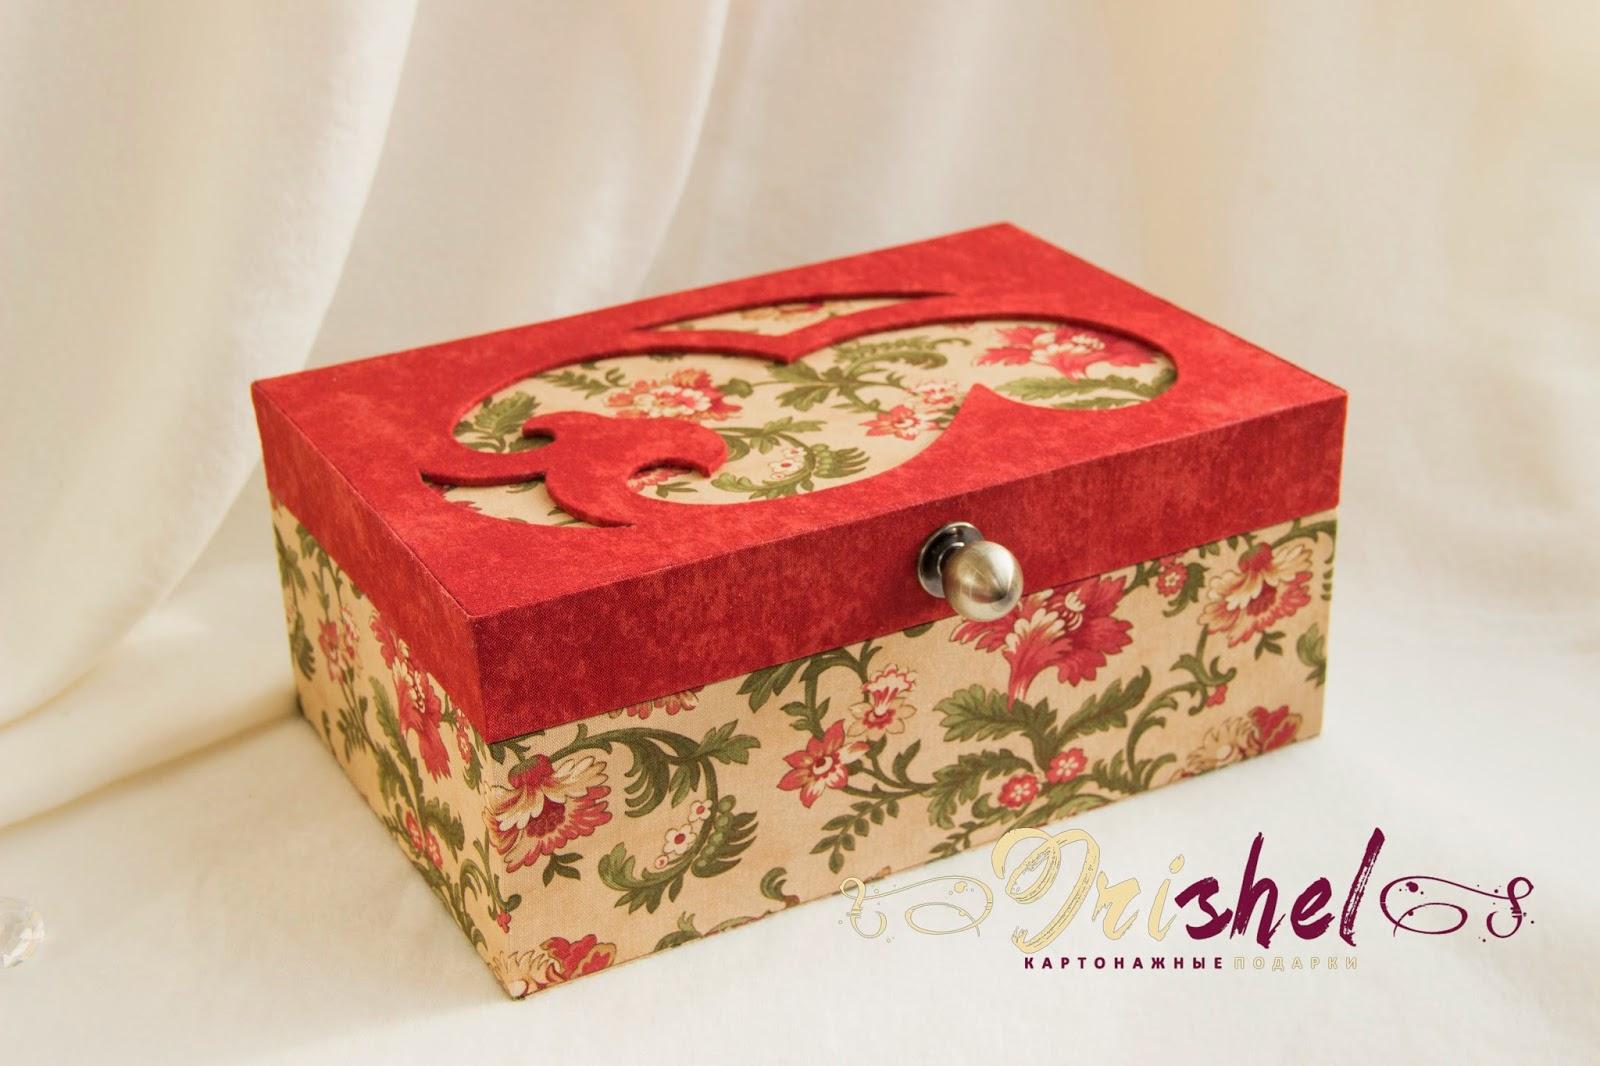 шкатулка своими руками, картонаж, картонаж мастер класс, картонажная шкатулка, как сделать шкатулку